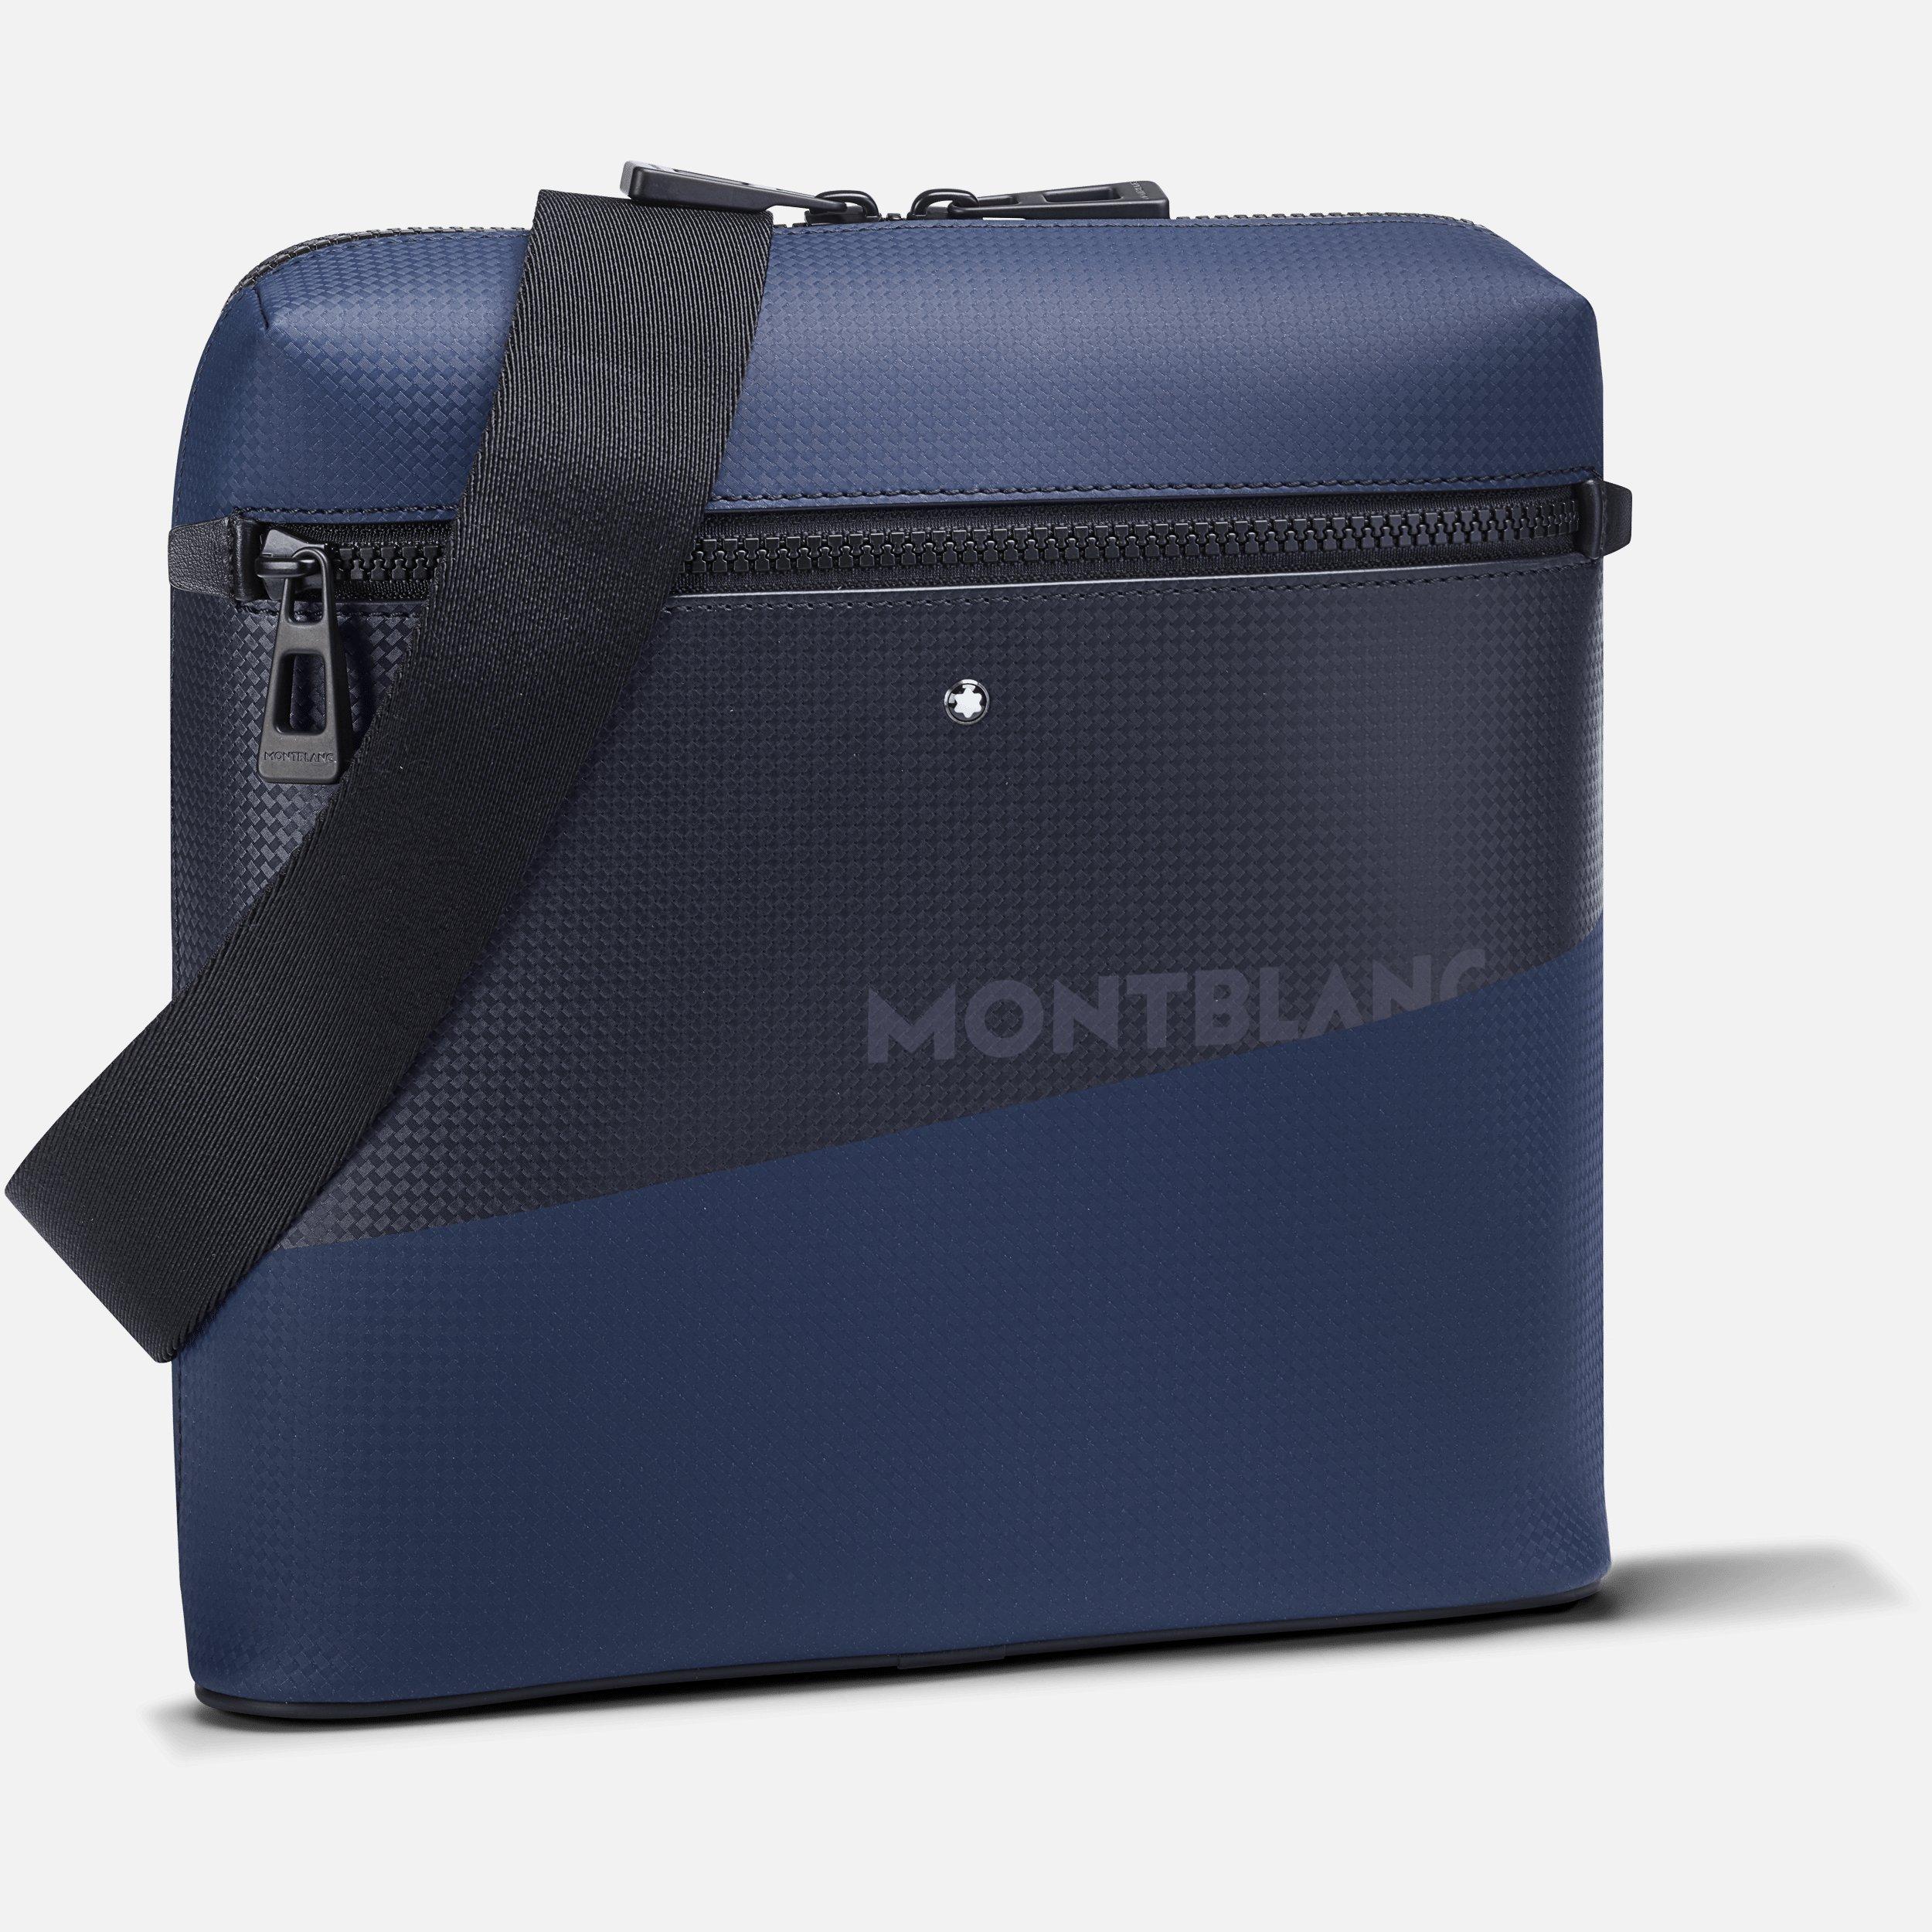 Envelope Bag con soffietto Montblanc Extreme 2.0